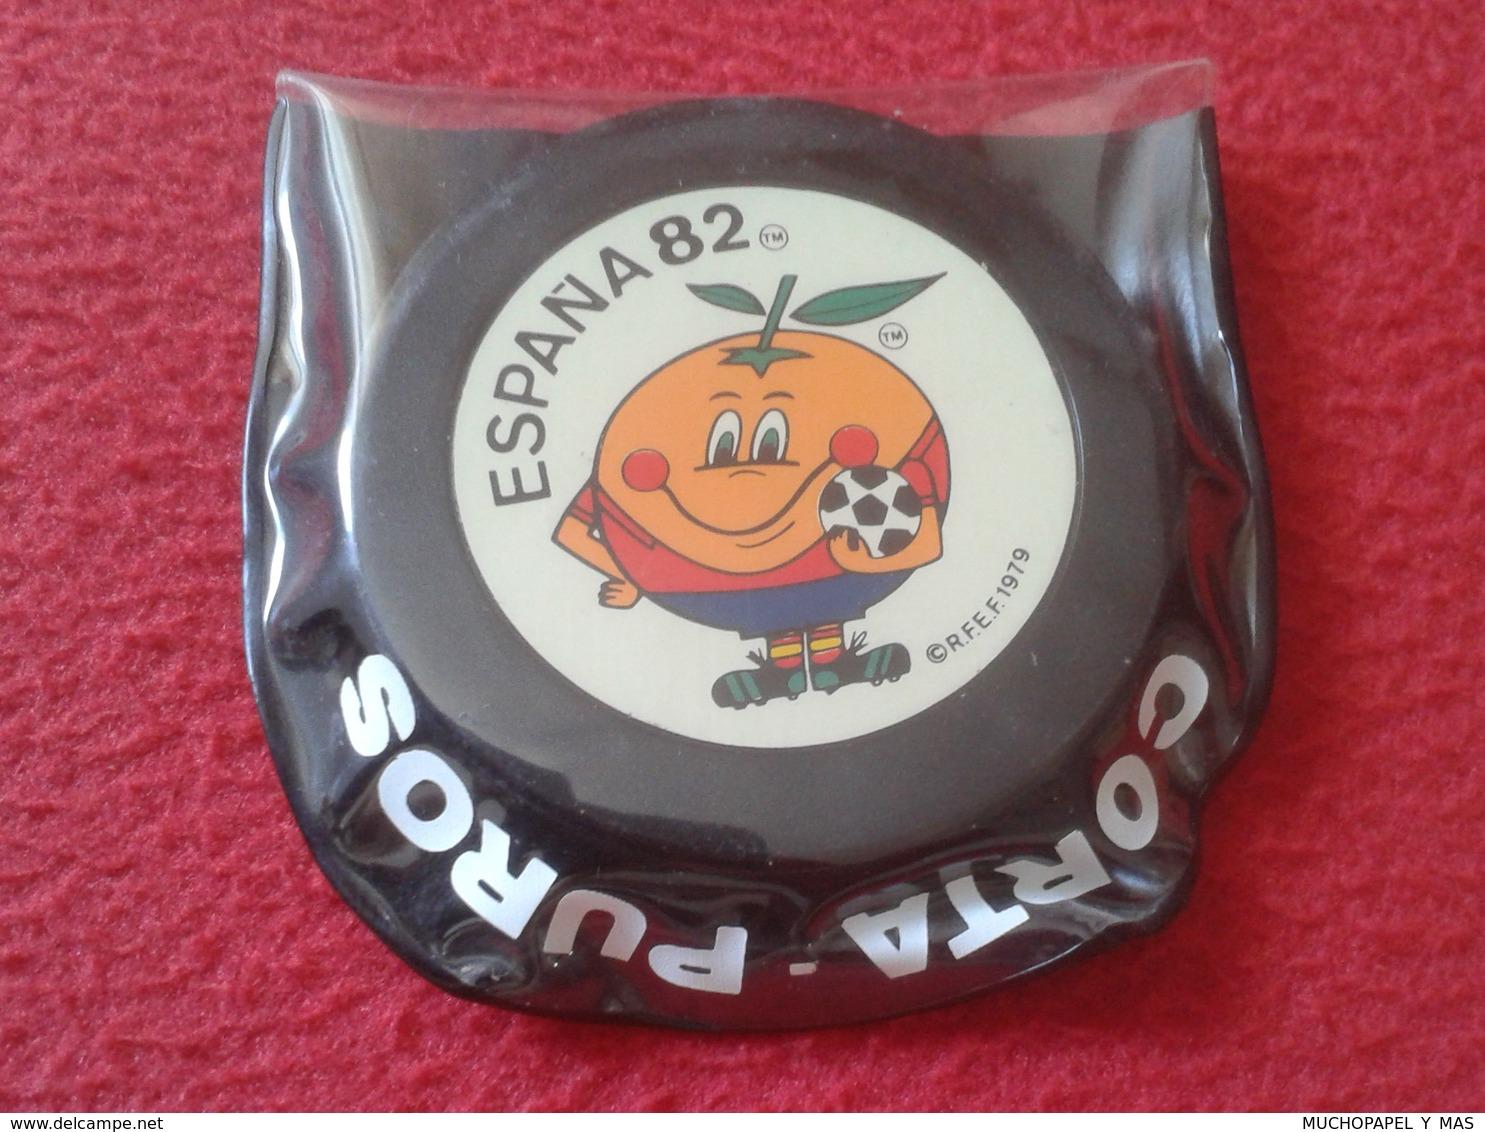 CORTAPUROS CORTA PUROS NARANJITO MASCOTA DEL MUNDIAL DE FÚTBOL ESPAÑA 82 1982 WORLD CUP FOOTBALL SOCCER OLD CIGAR CUTTER - Taglia-sigari